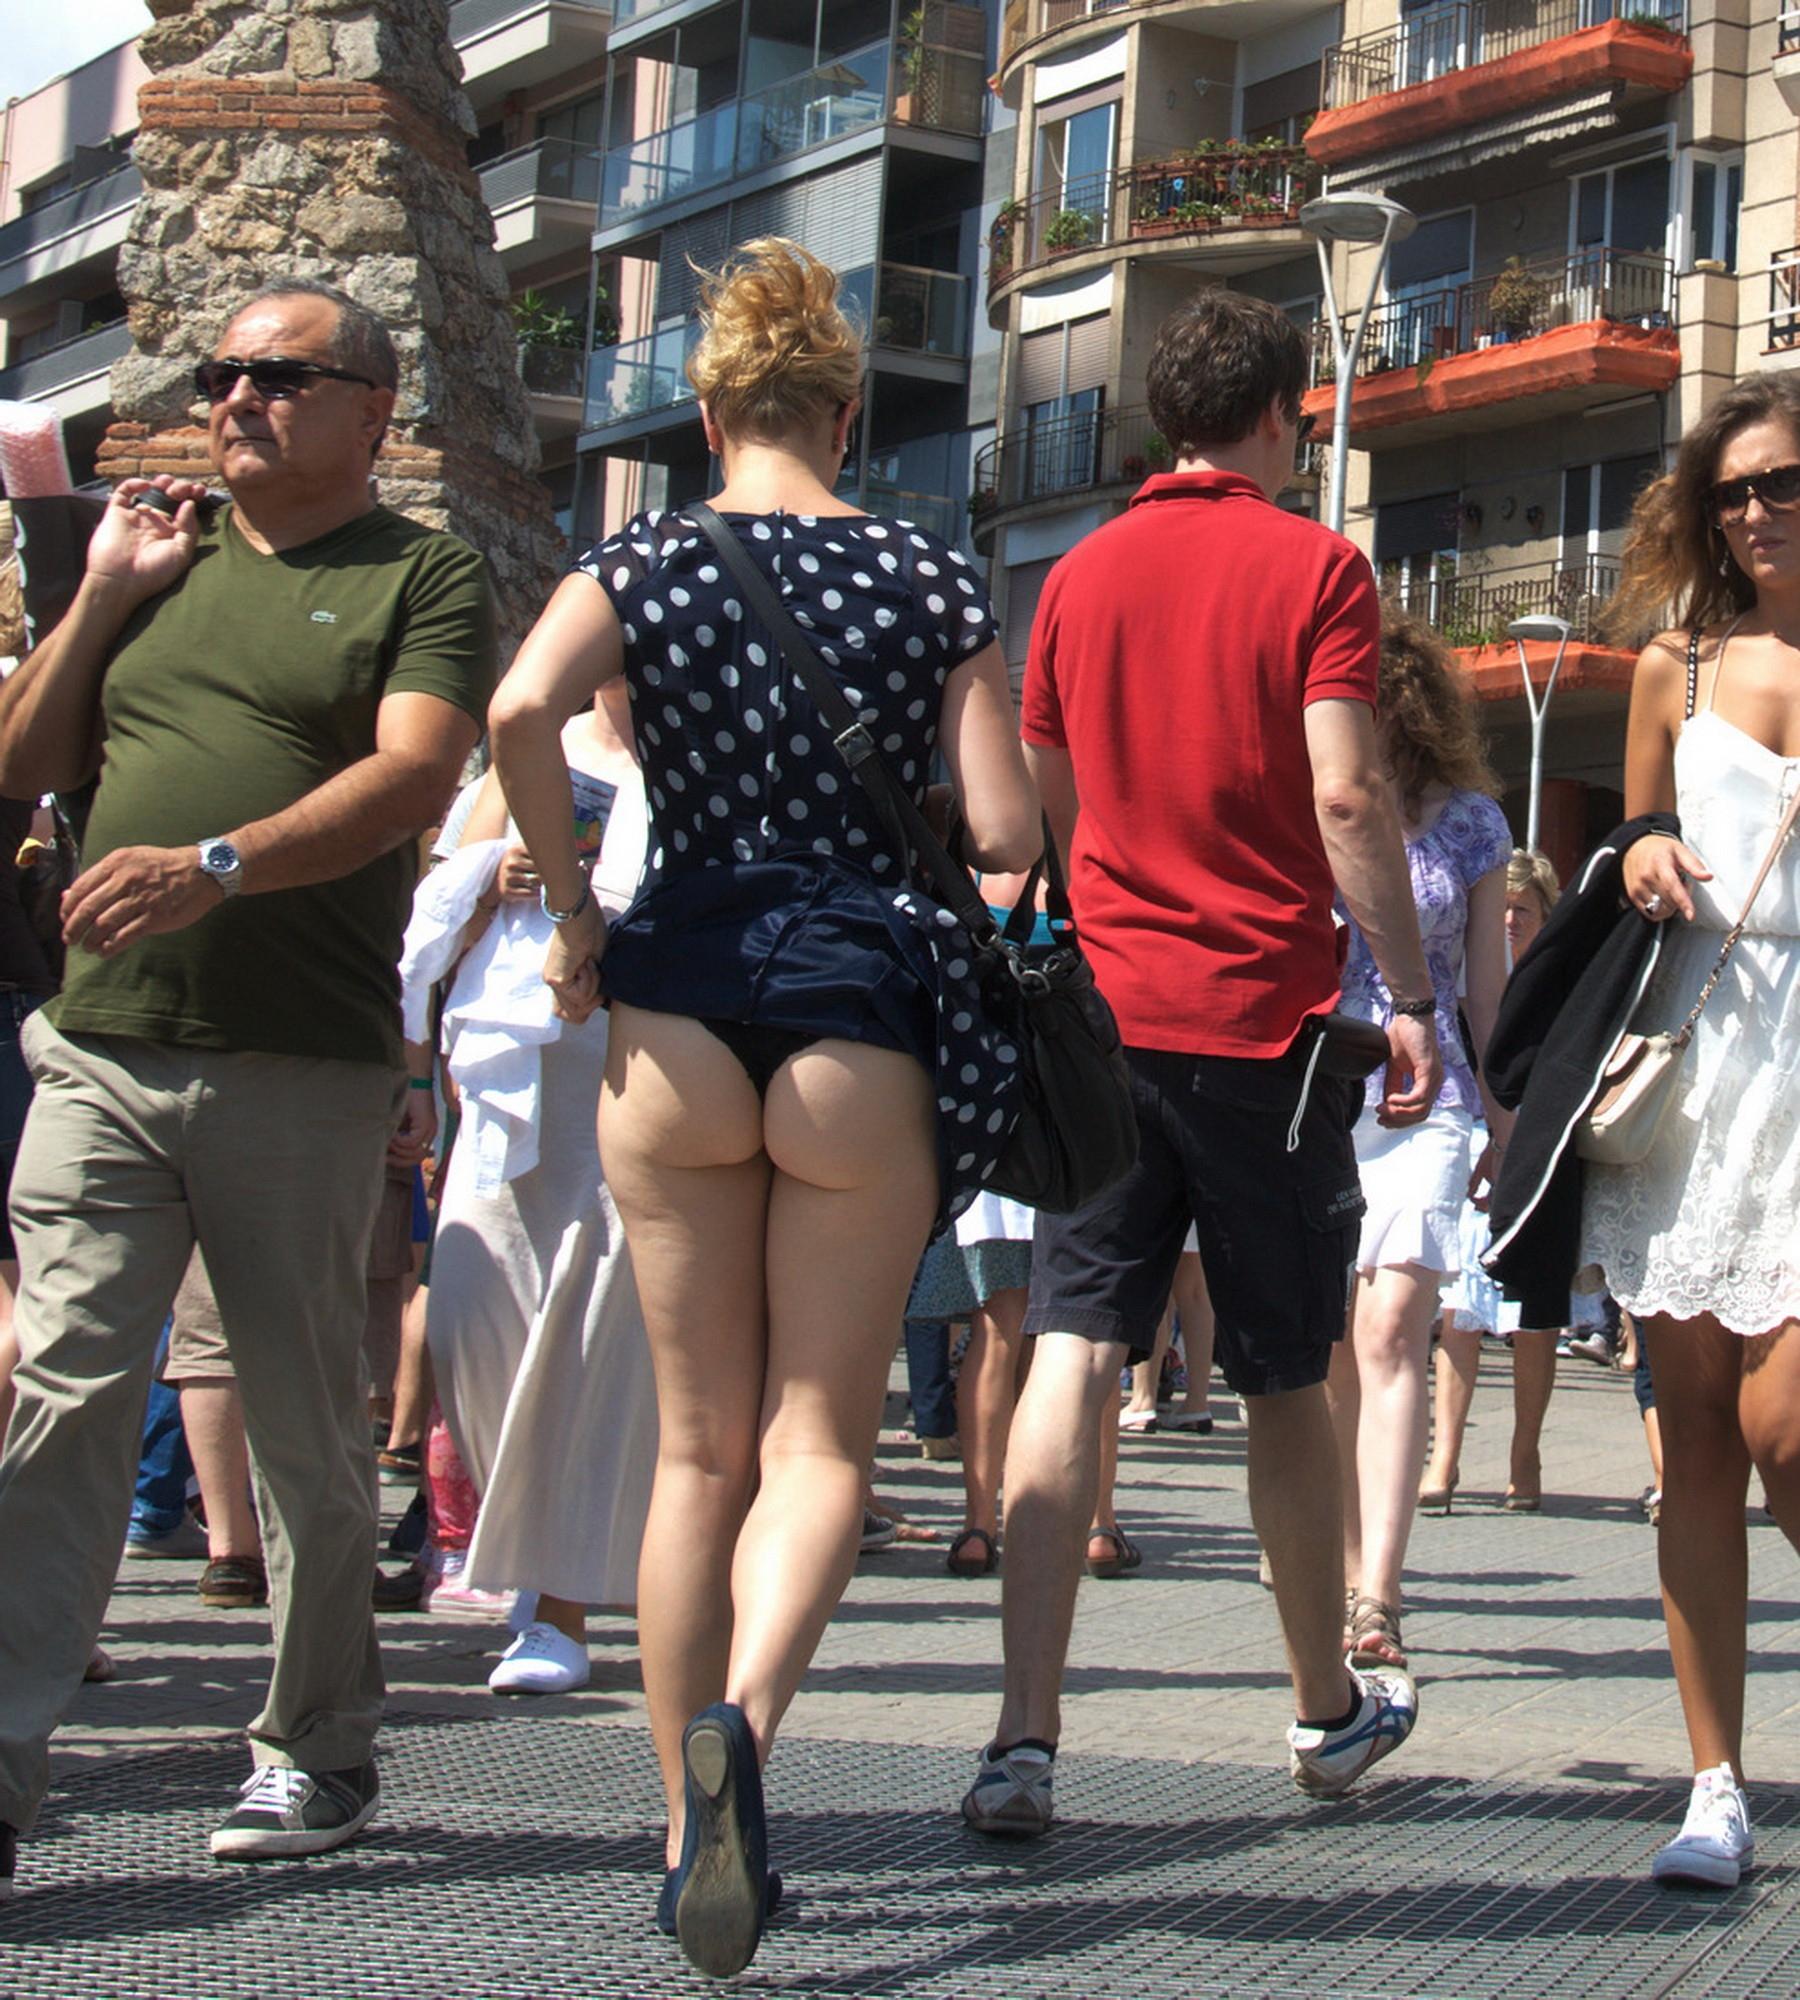 На улице задралась юбка фото 173-648